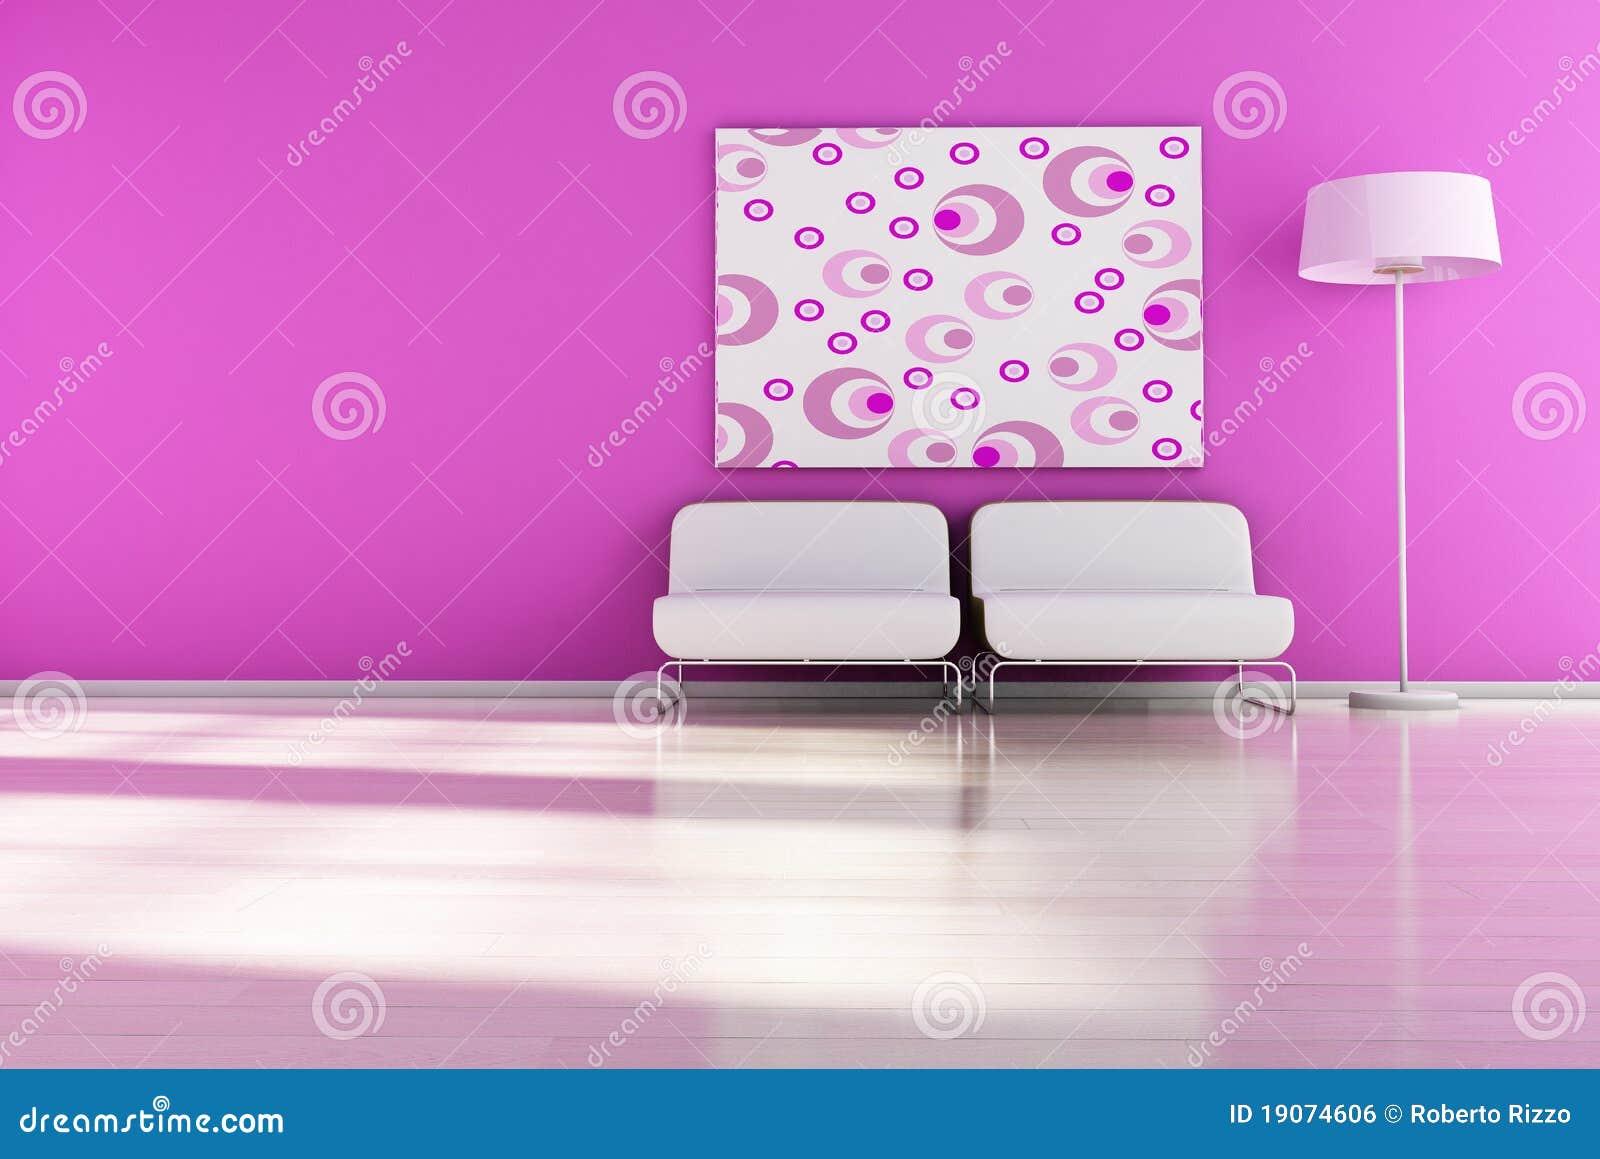 Retro interior stock illustration illustration of for 1950s minimalist house